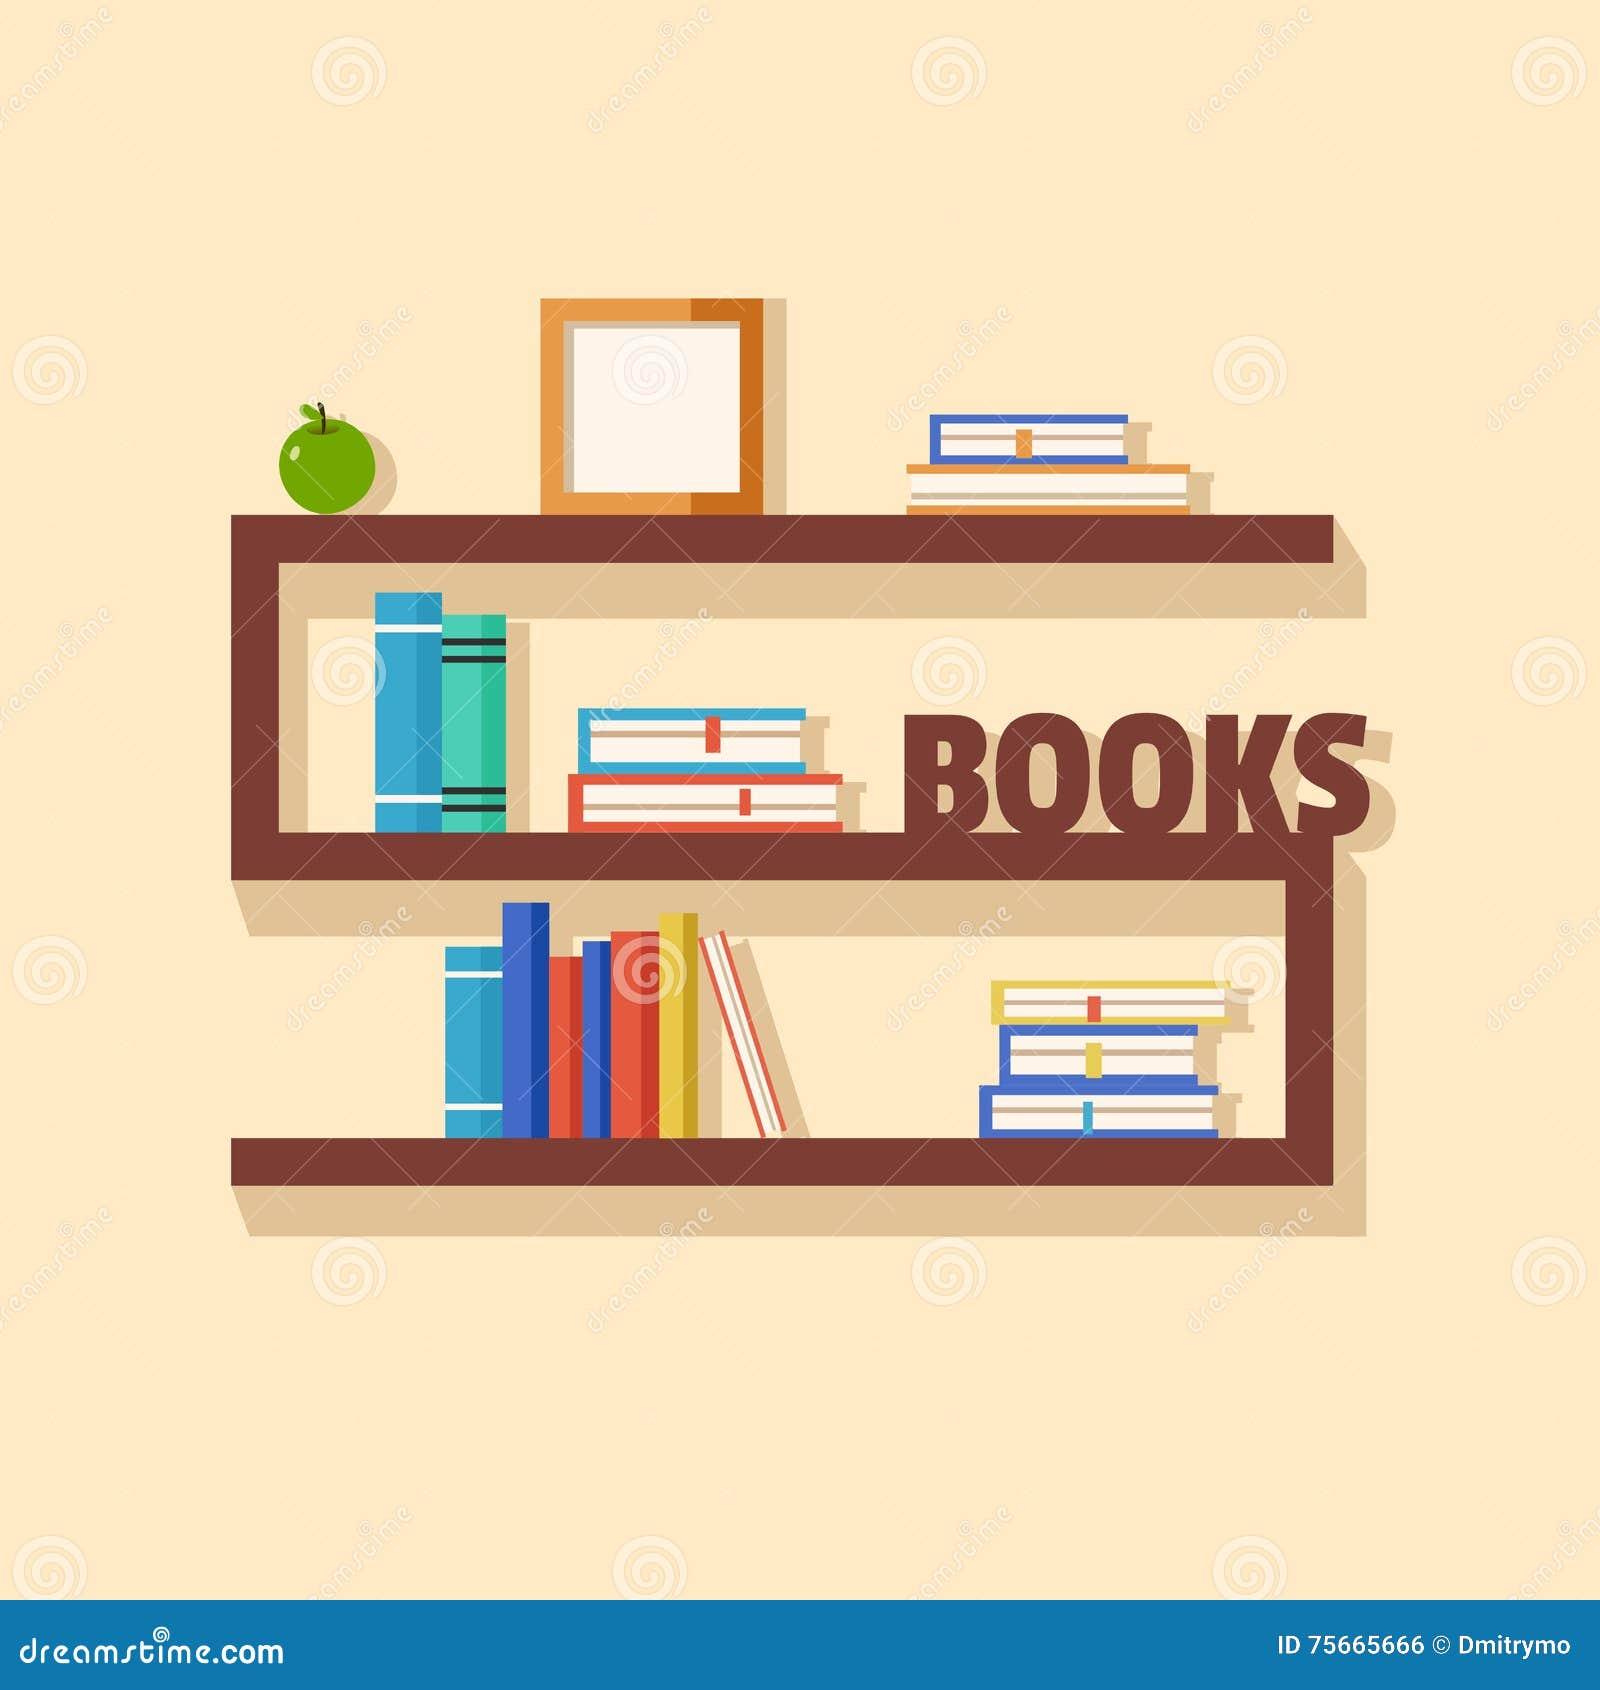 Interior wooden shelves free vector - Books Bookshelf Bookshelves Collection Flat Illustration Interior Paper Vector Wooden Book Stack Element Bookcase